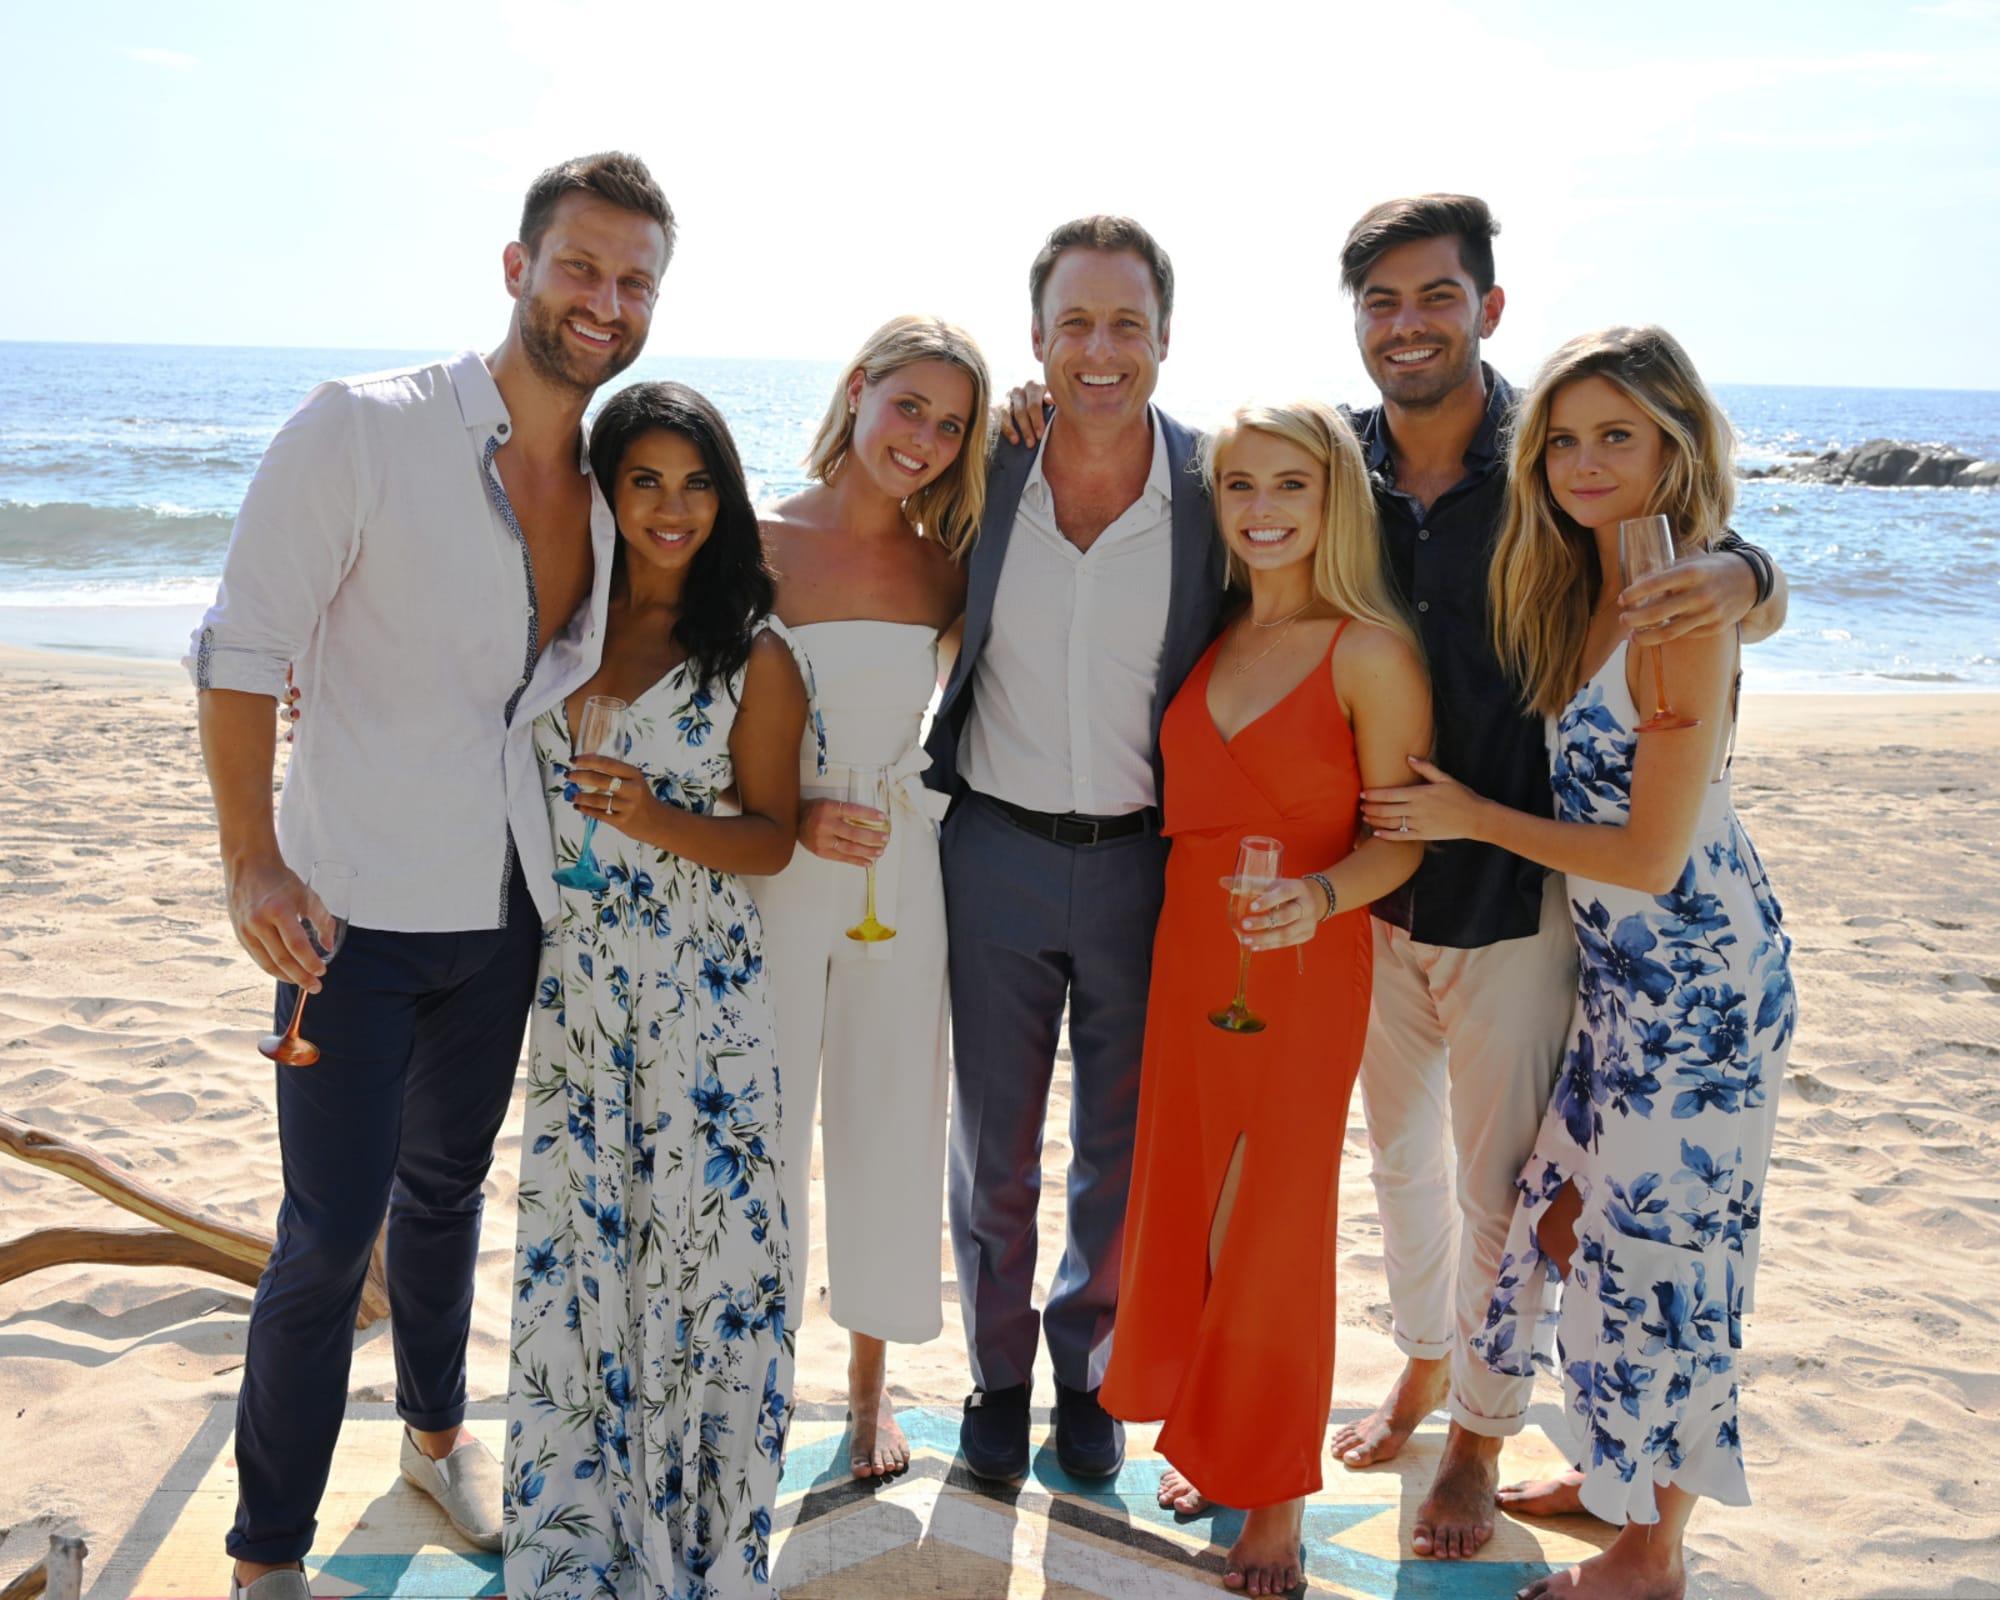 Bachelor in Paradise Season 7 Episode 2